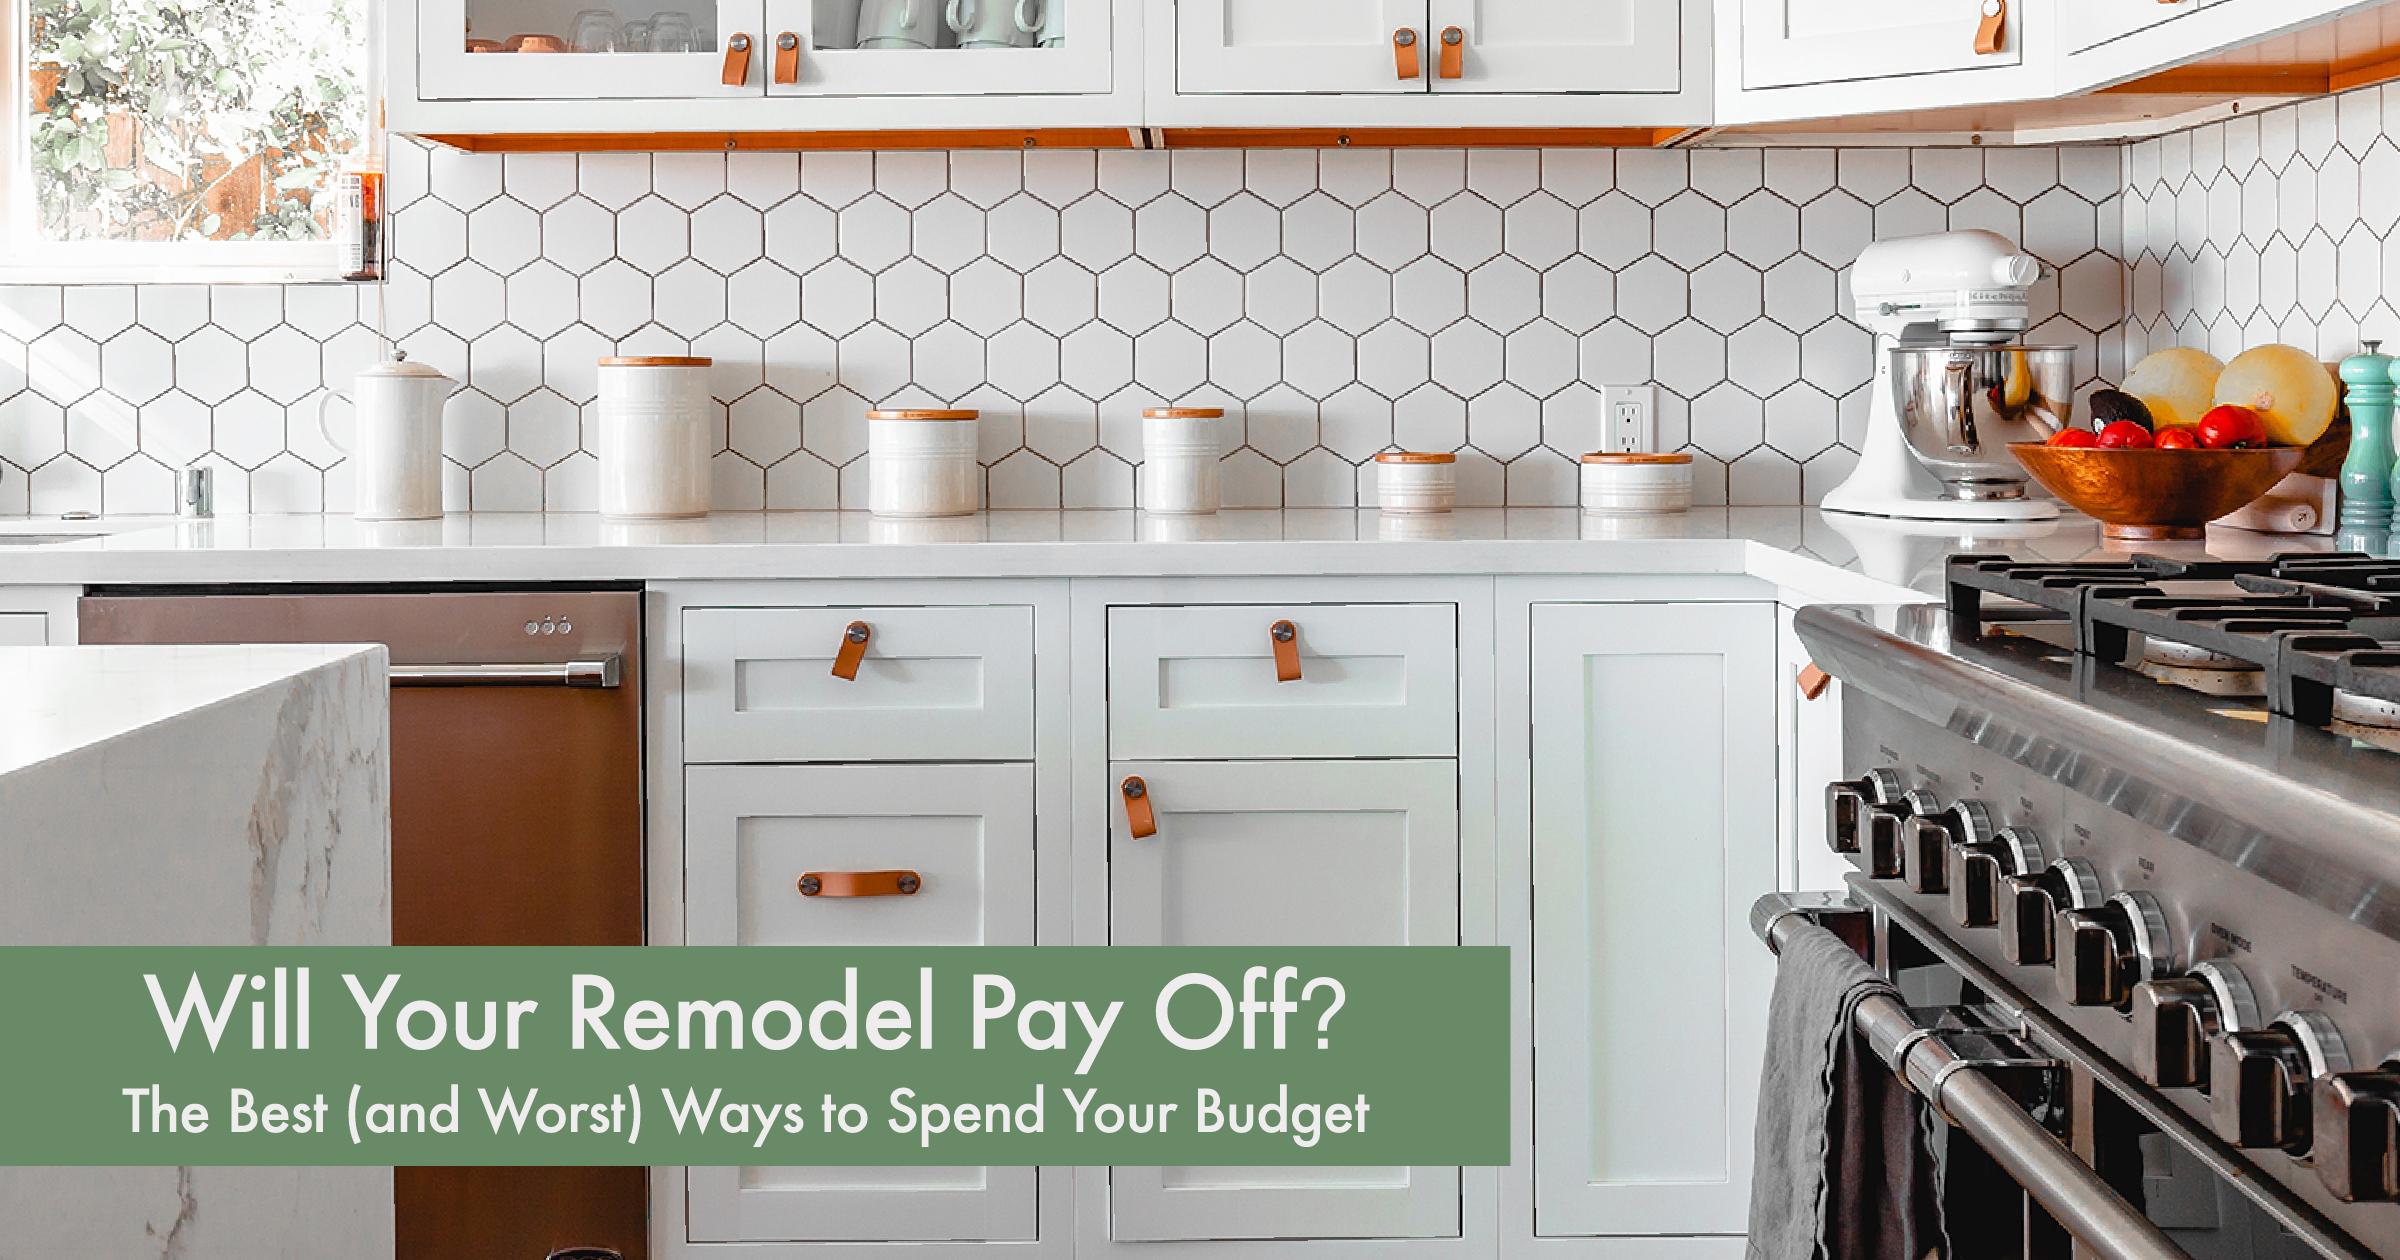 Remodel Cost vs Value